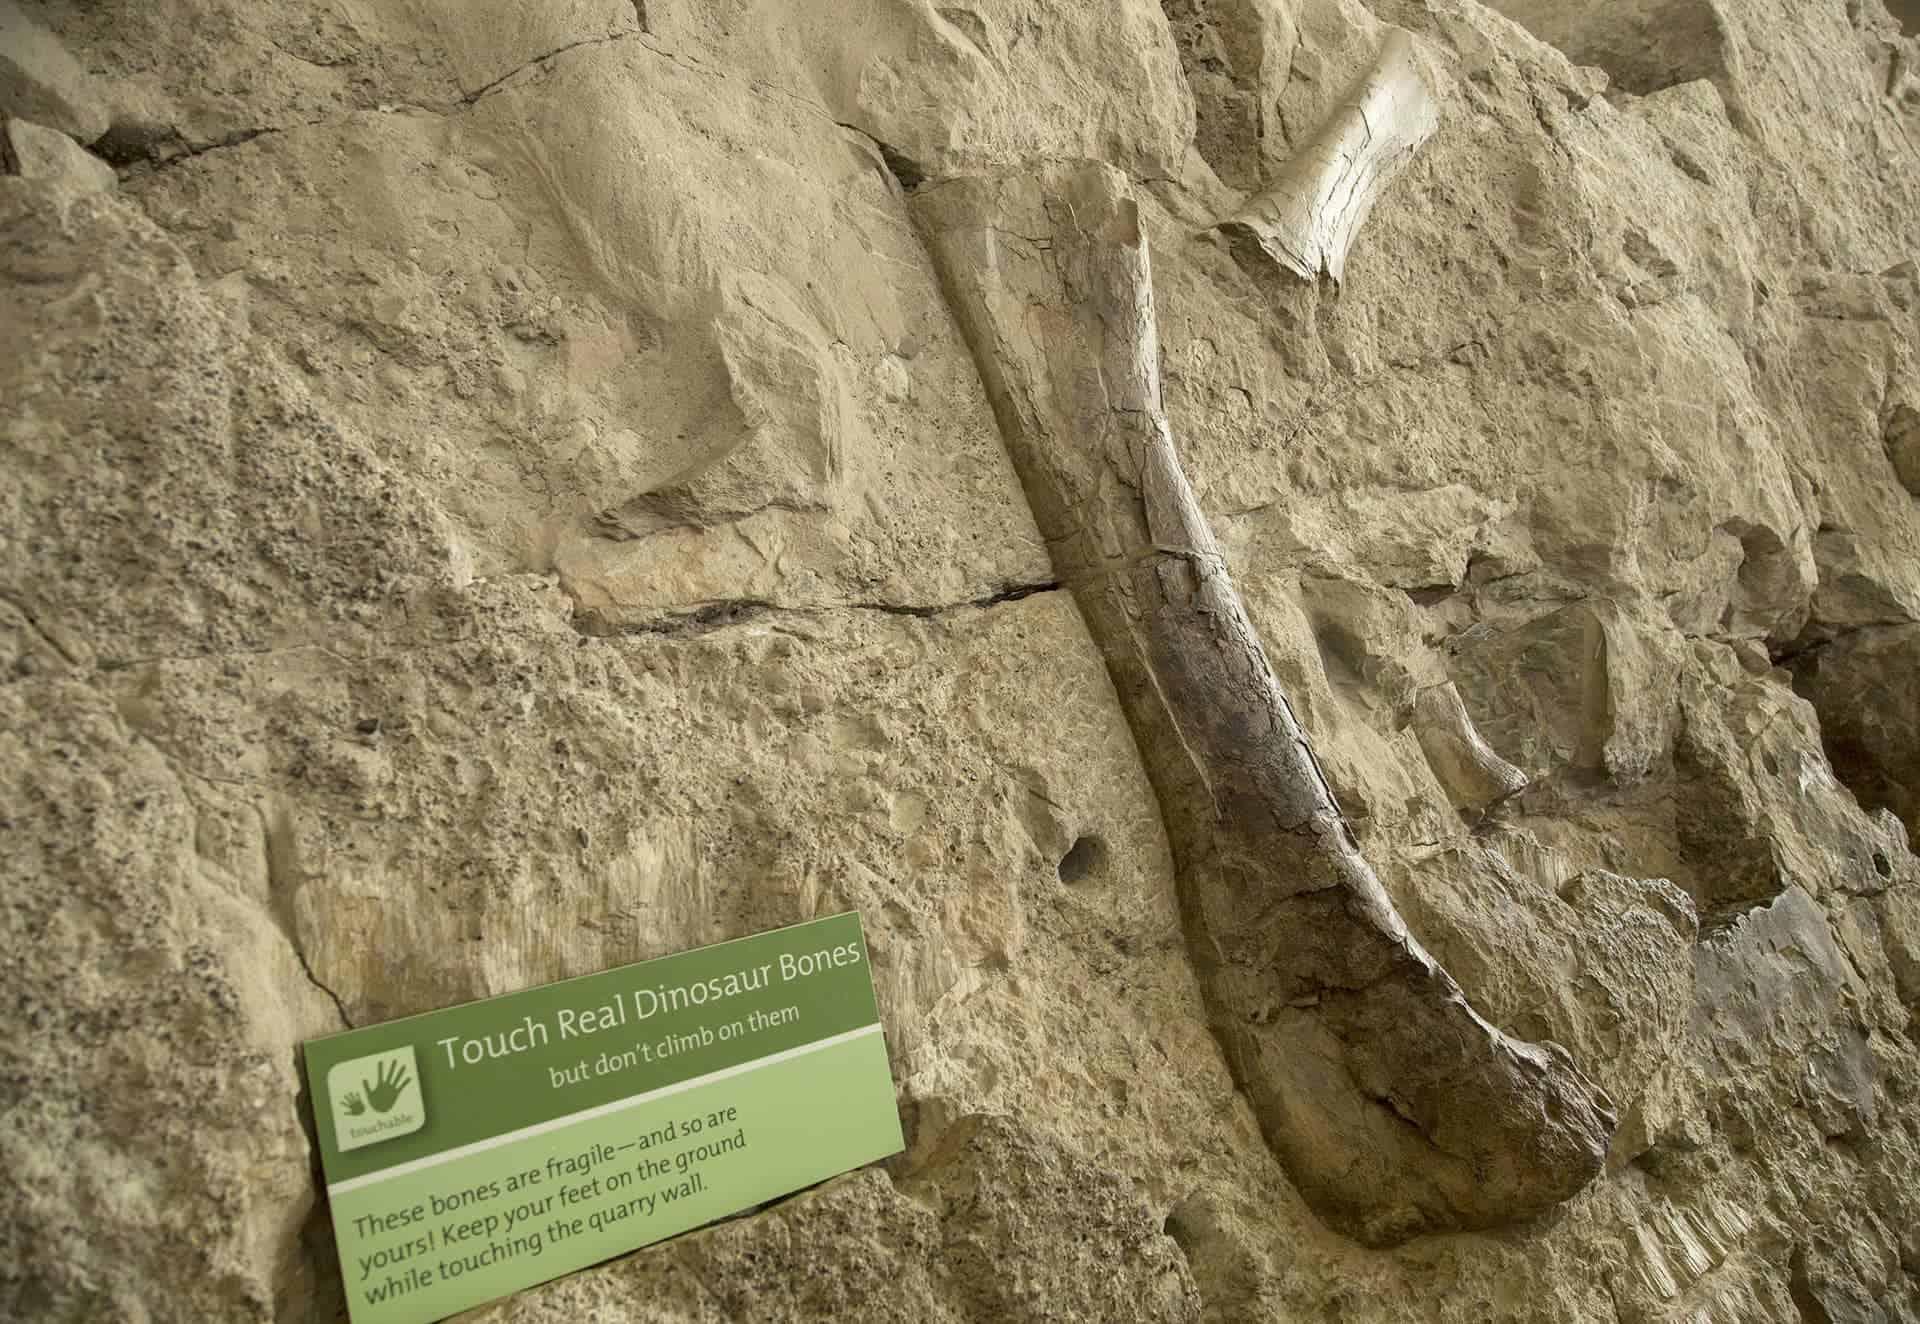 National Dinosaur Monument. (Photo by Kyle Greenburg)